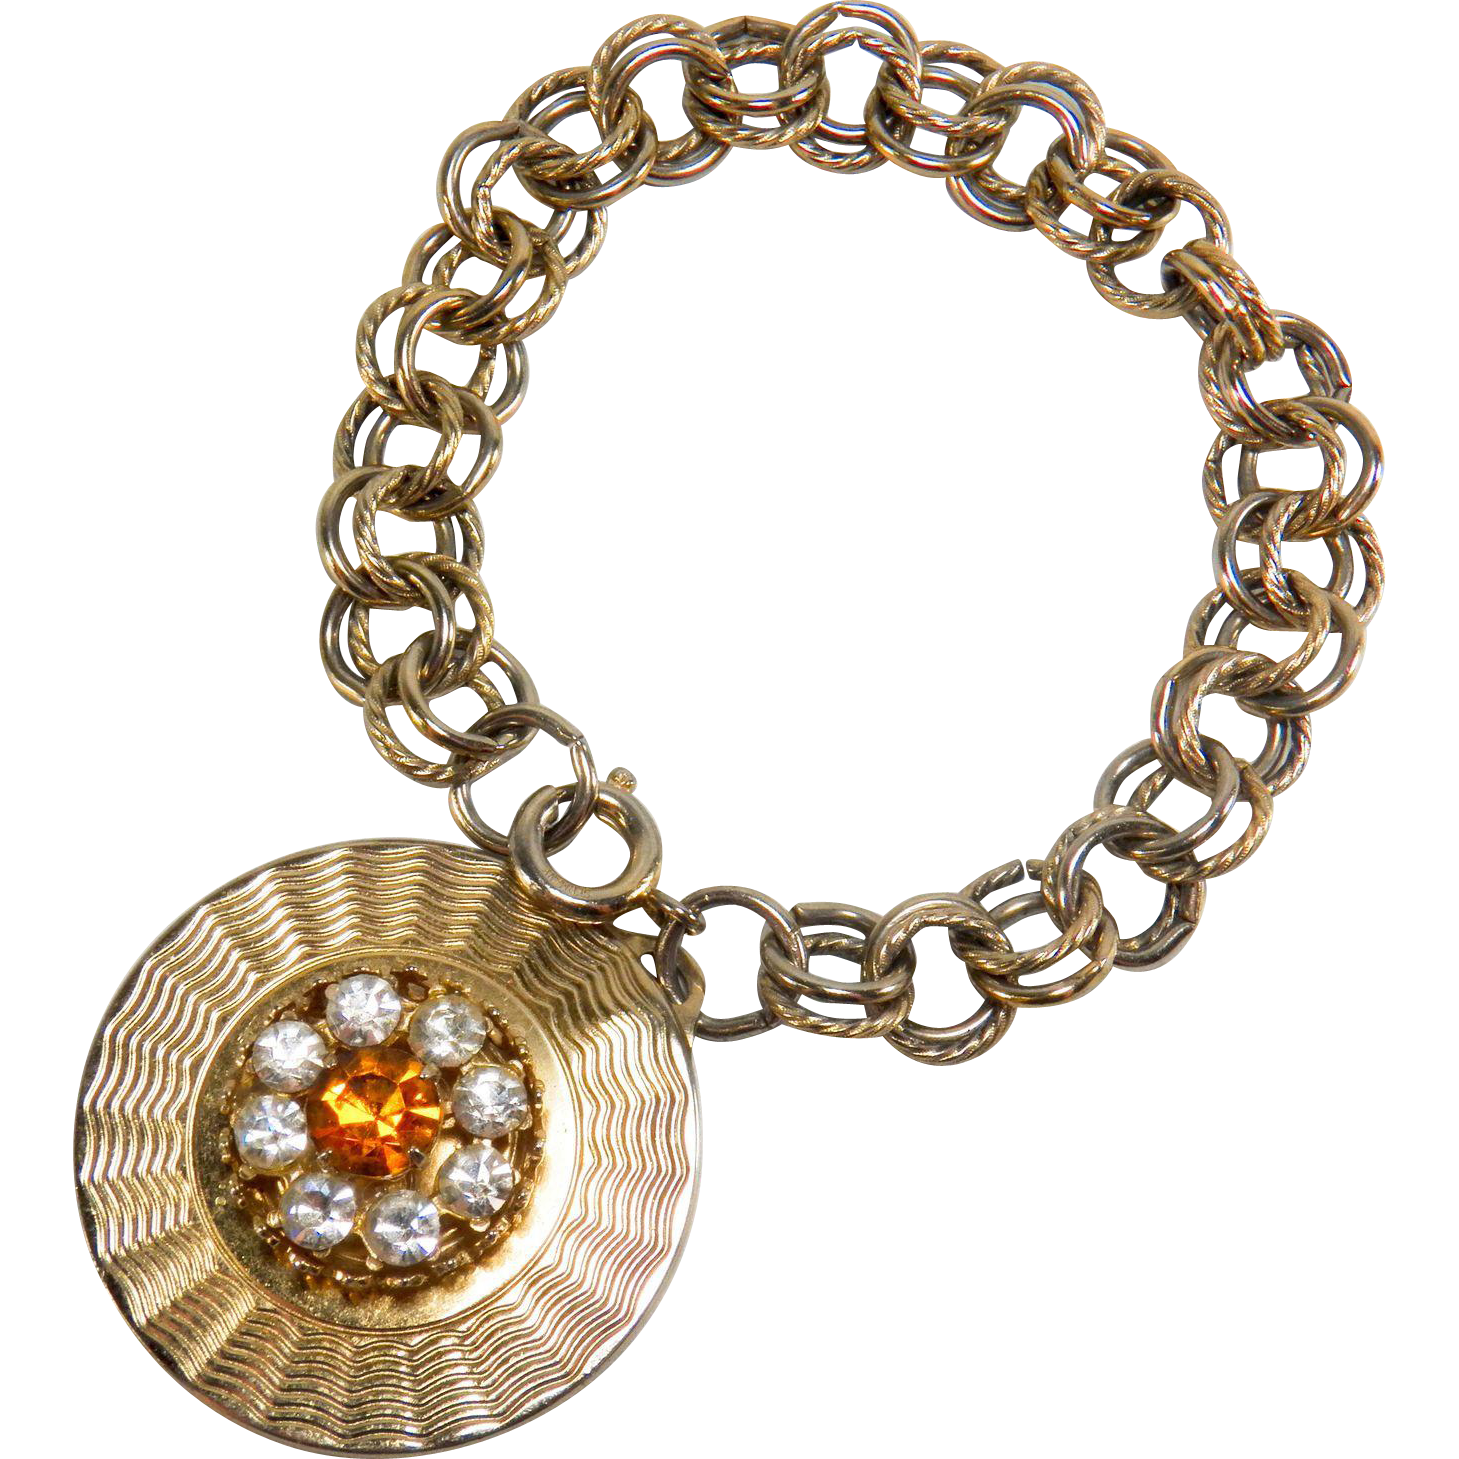 Vintage Signed Coro Jewelled Rhinestone Medallion Pendant Charm Double Link Yellow Gold Toned Bracelet